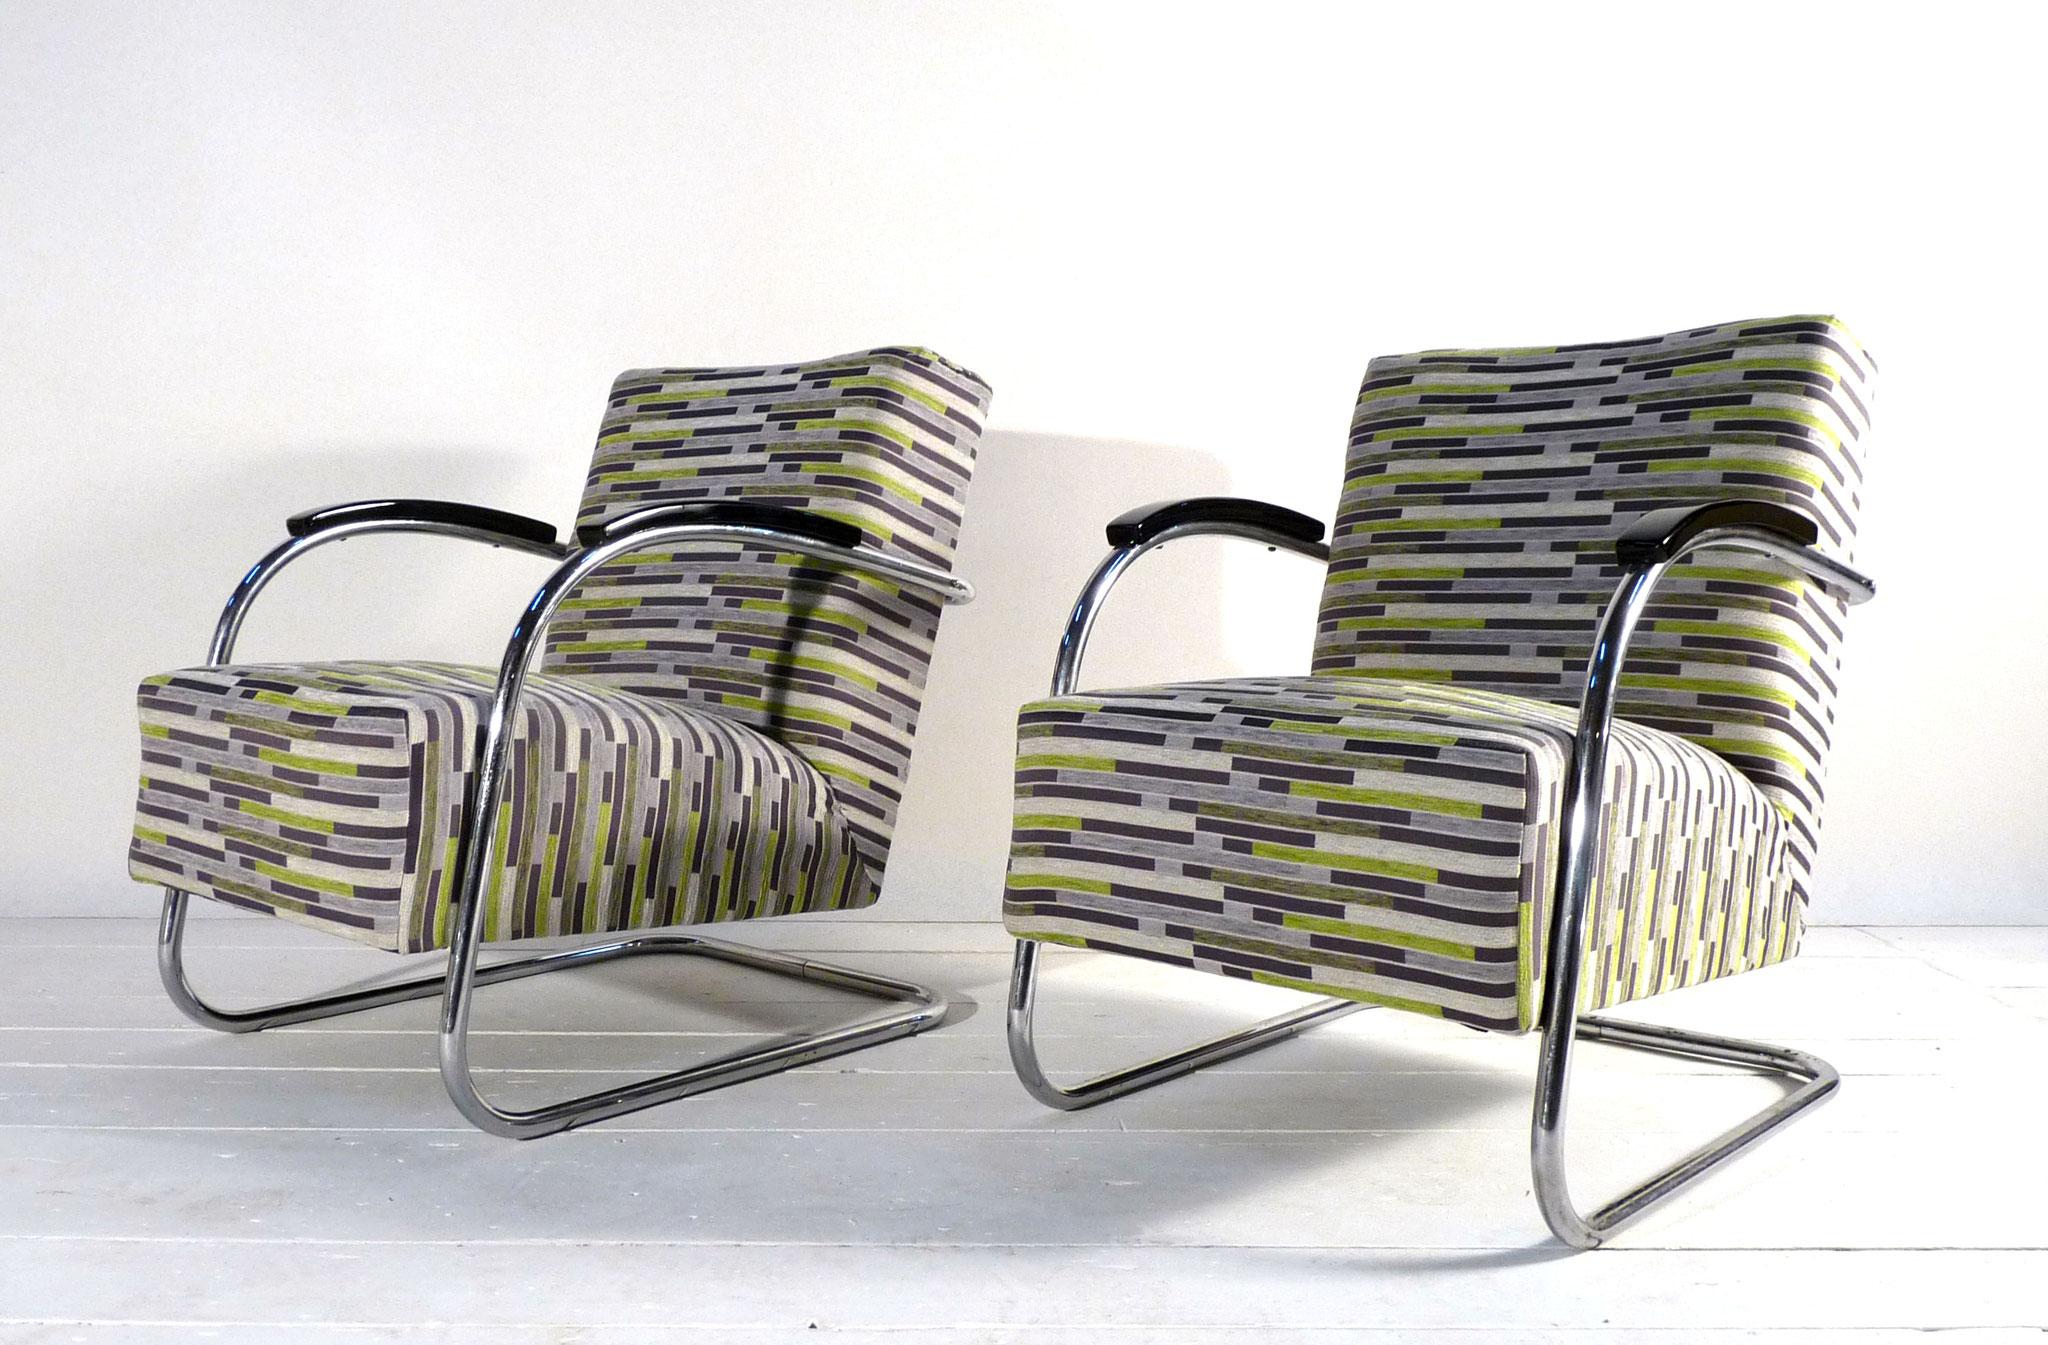 Bauhaus Originale Bauhaus Möbel Sessel Stuhl Sofa